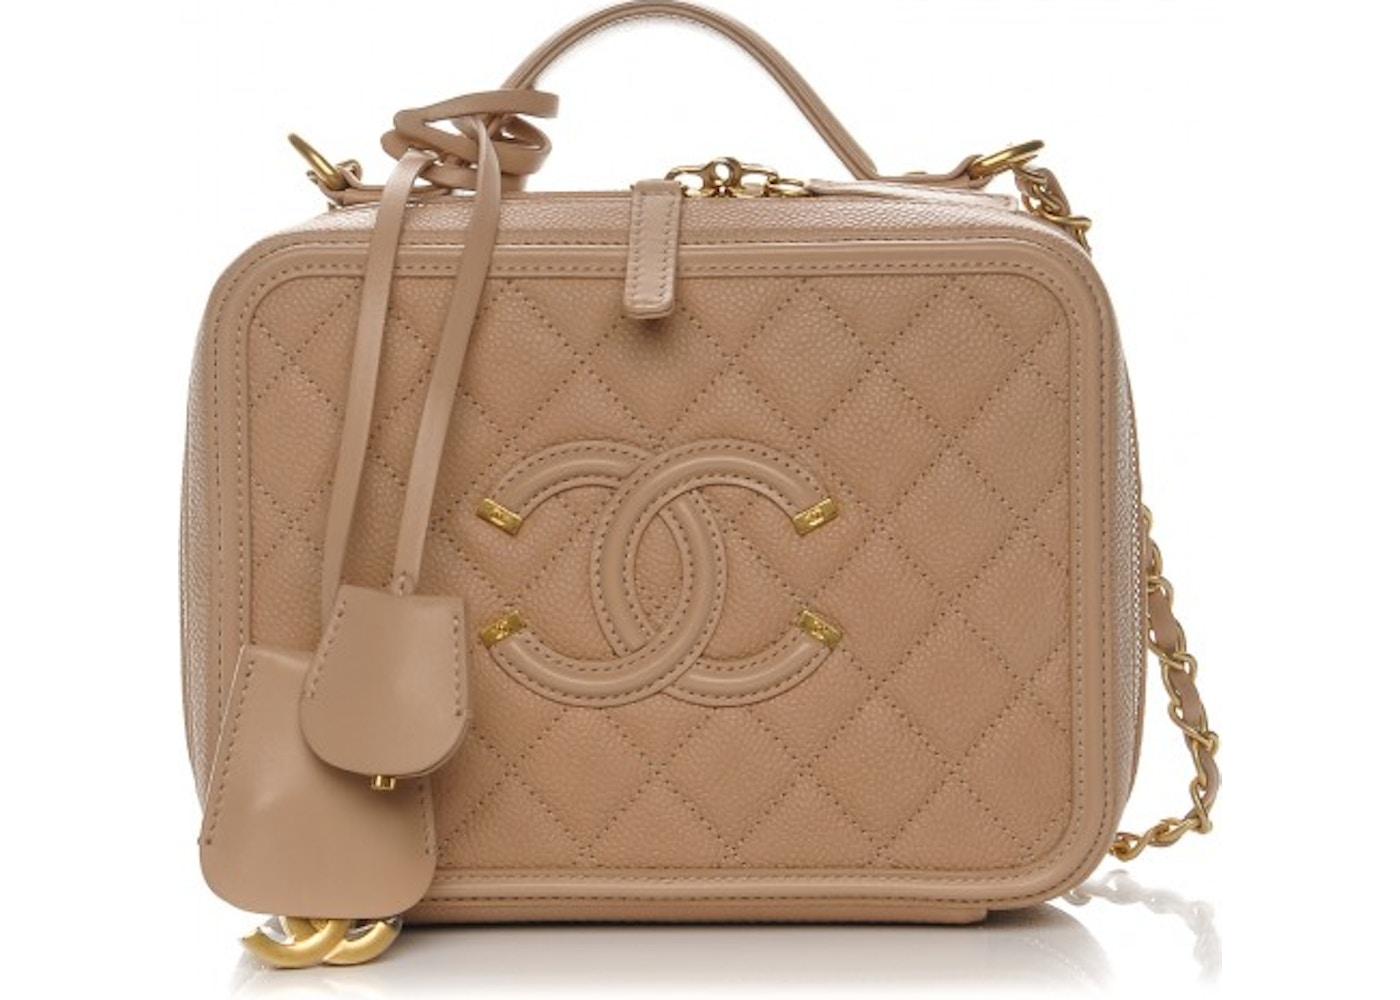 bc3374ffc111 Chanel Vanity Case Diamond Quilted CC Filigree Medium Beige. Diamond  Quilted CC Filigree Medium Beige